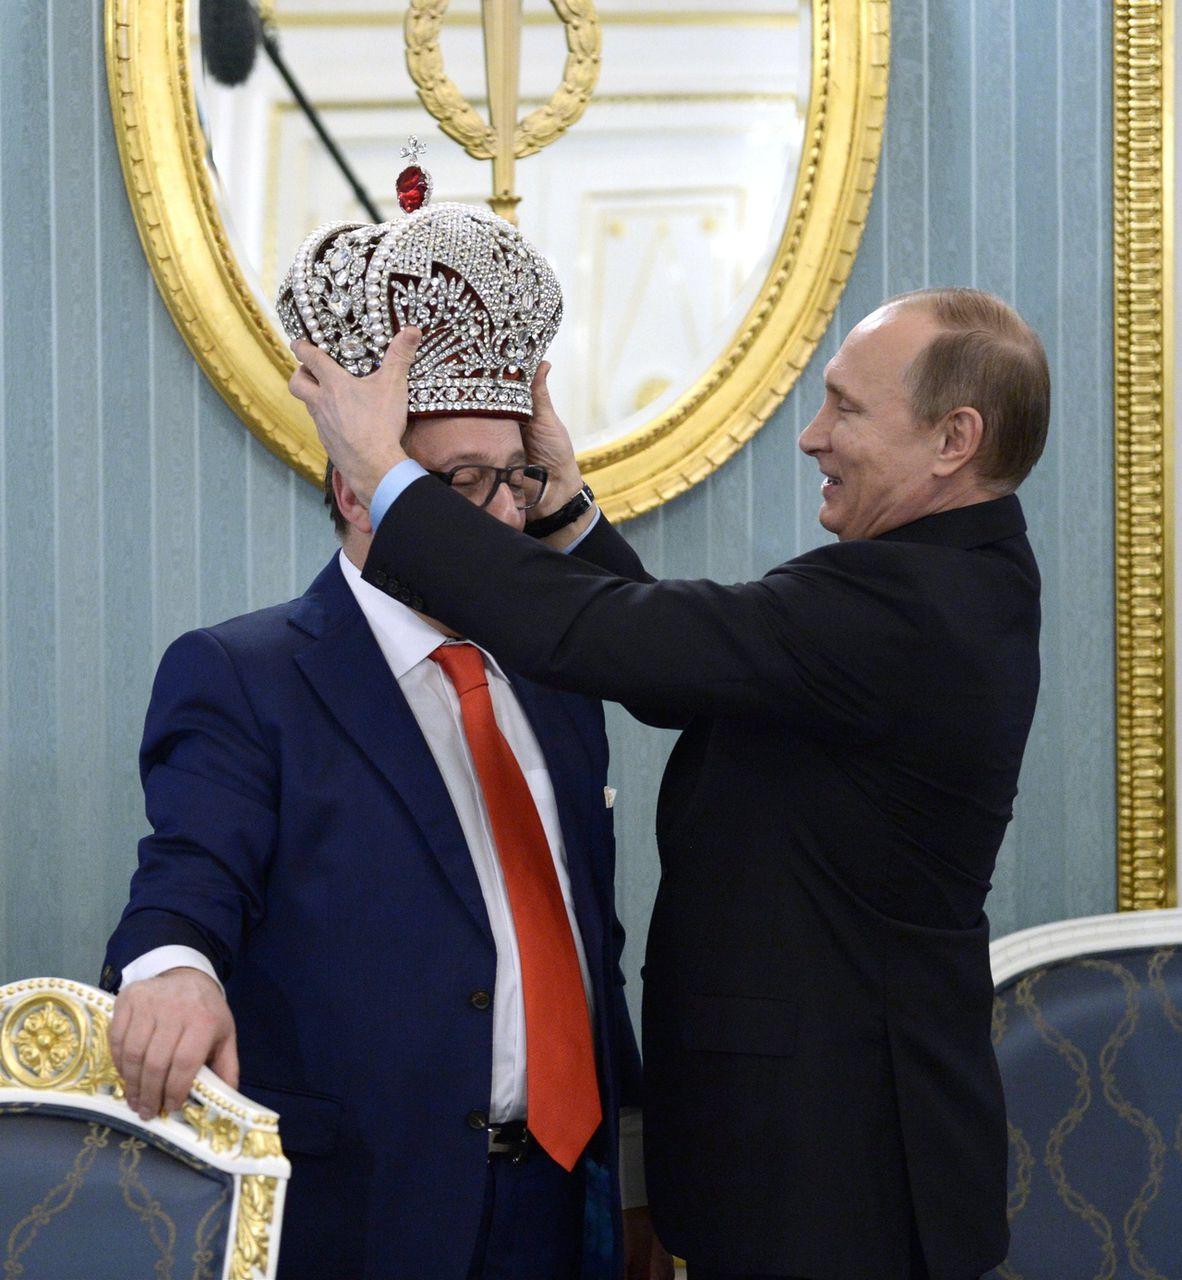 Путин и хазанов корона видео